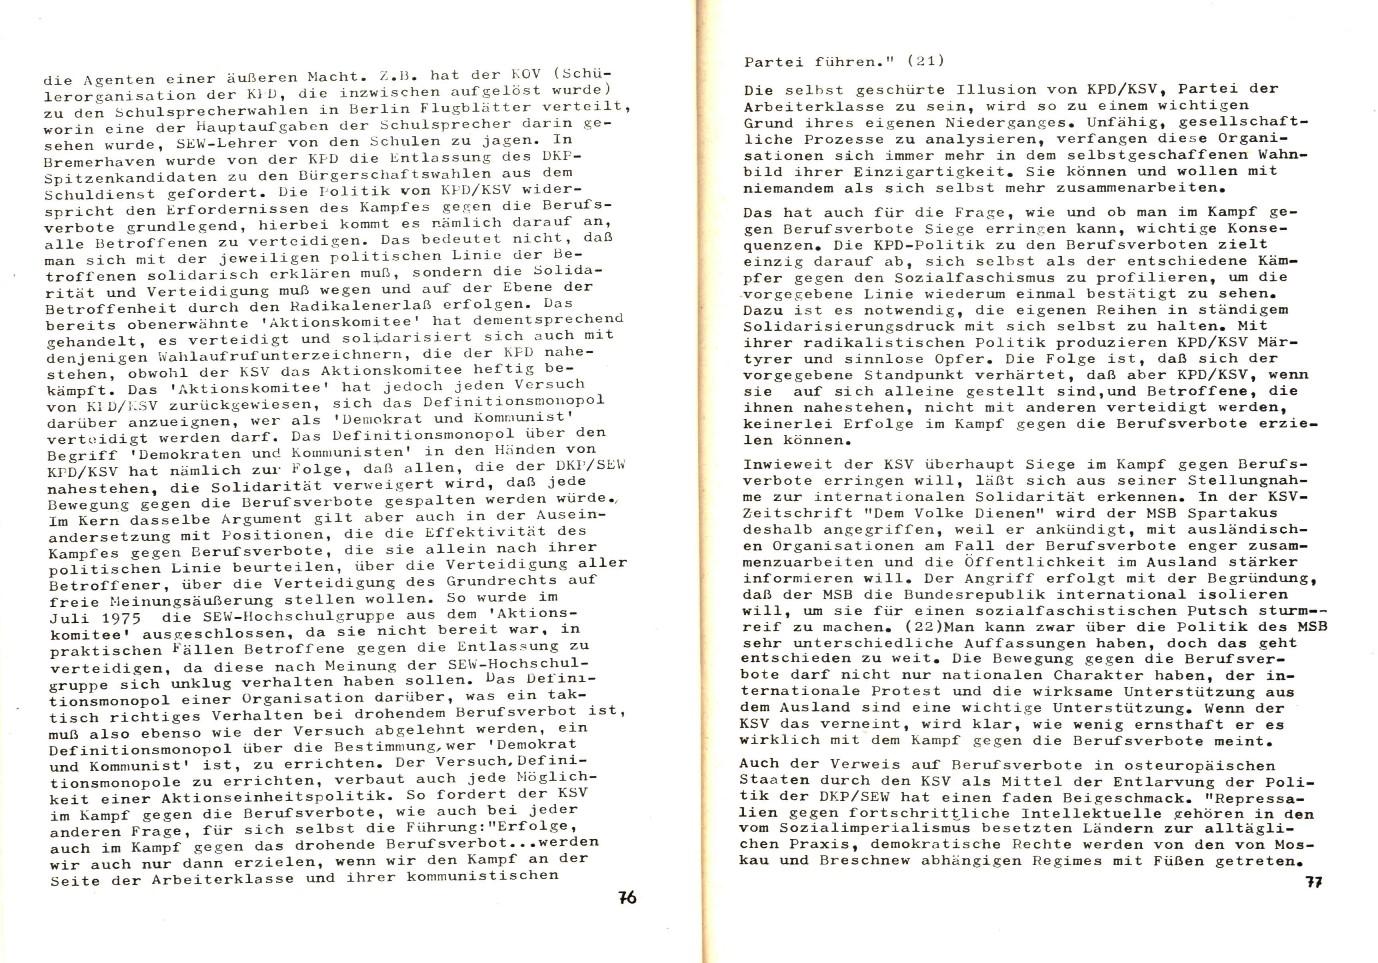 Berlin_KSV_1975_Dokumente_der_SAZ_40